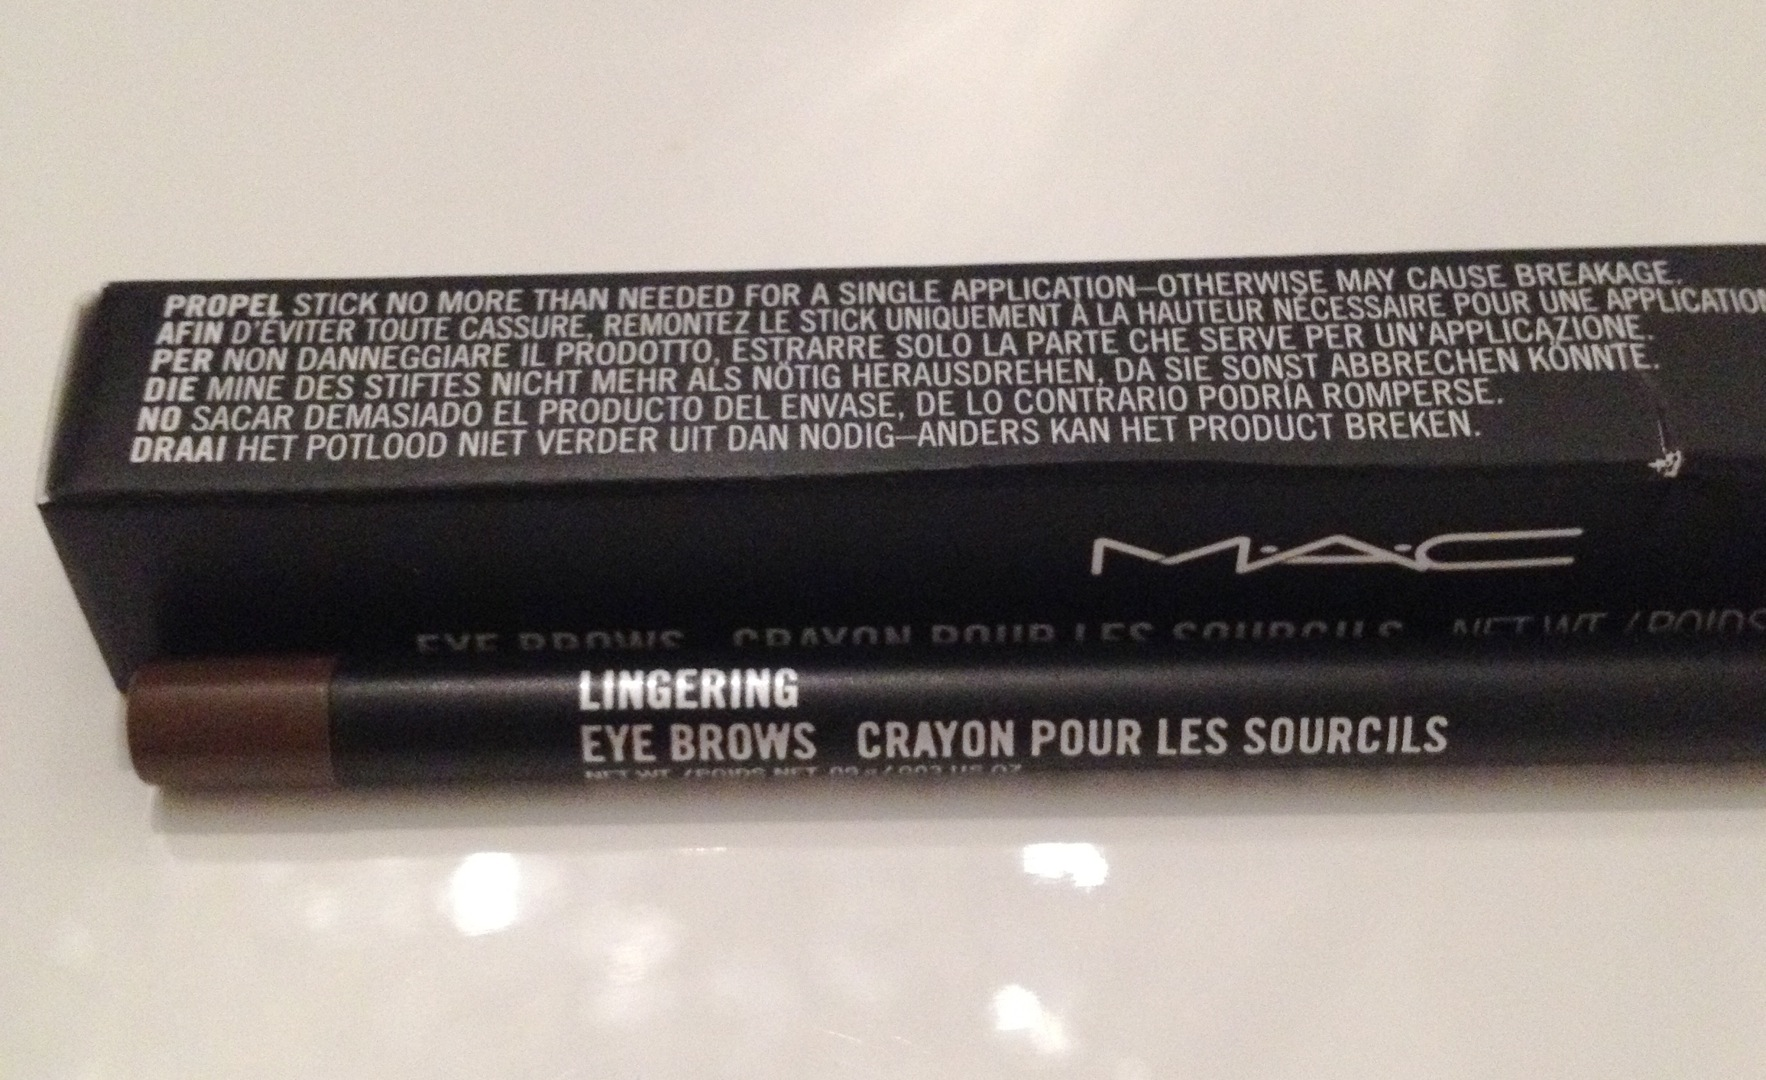 MAC Eye Brows crayon pour les sourcils. Farbe: Lingering